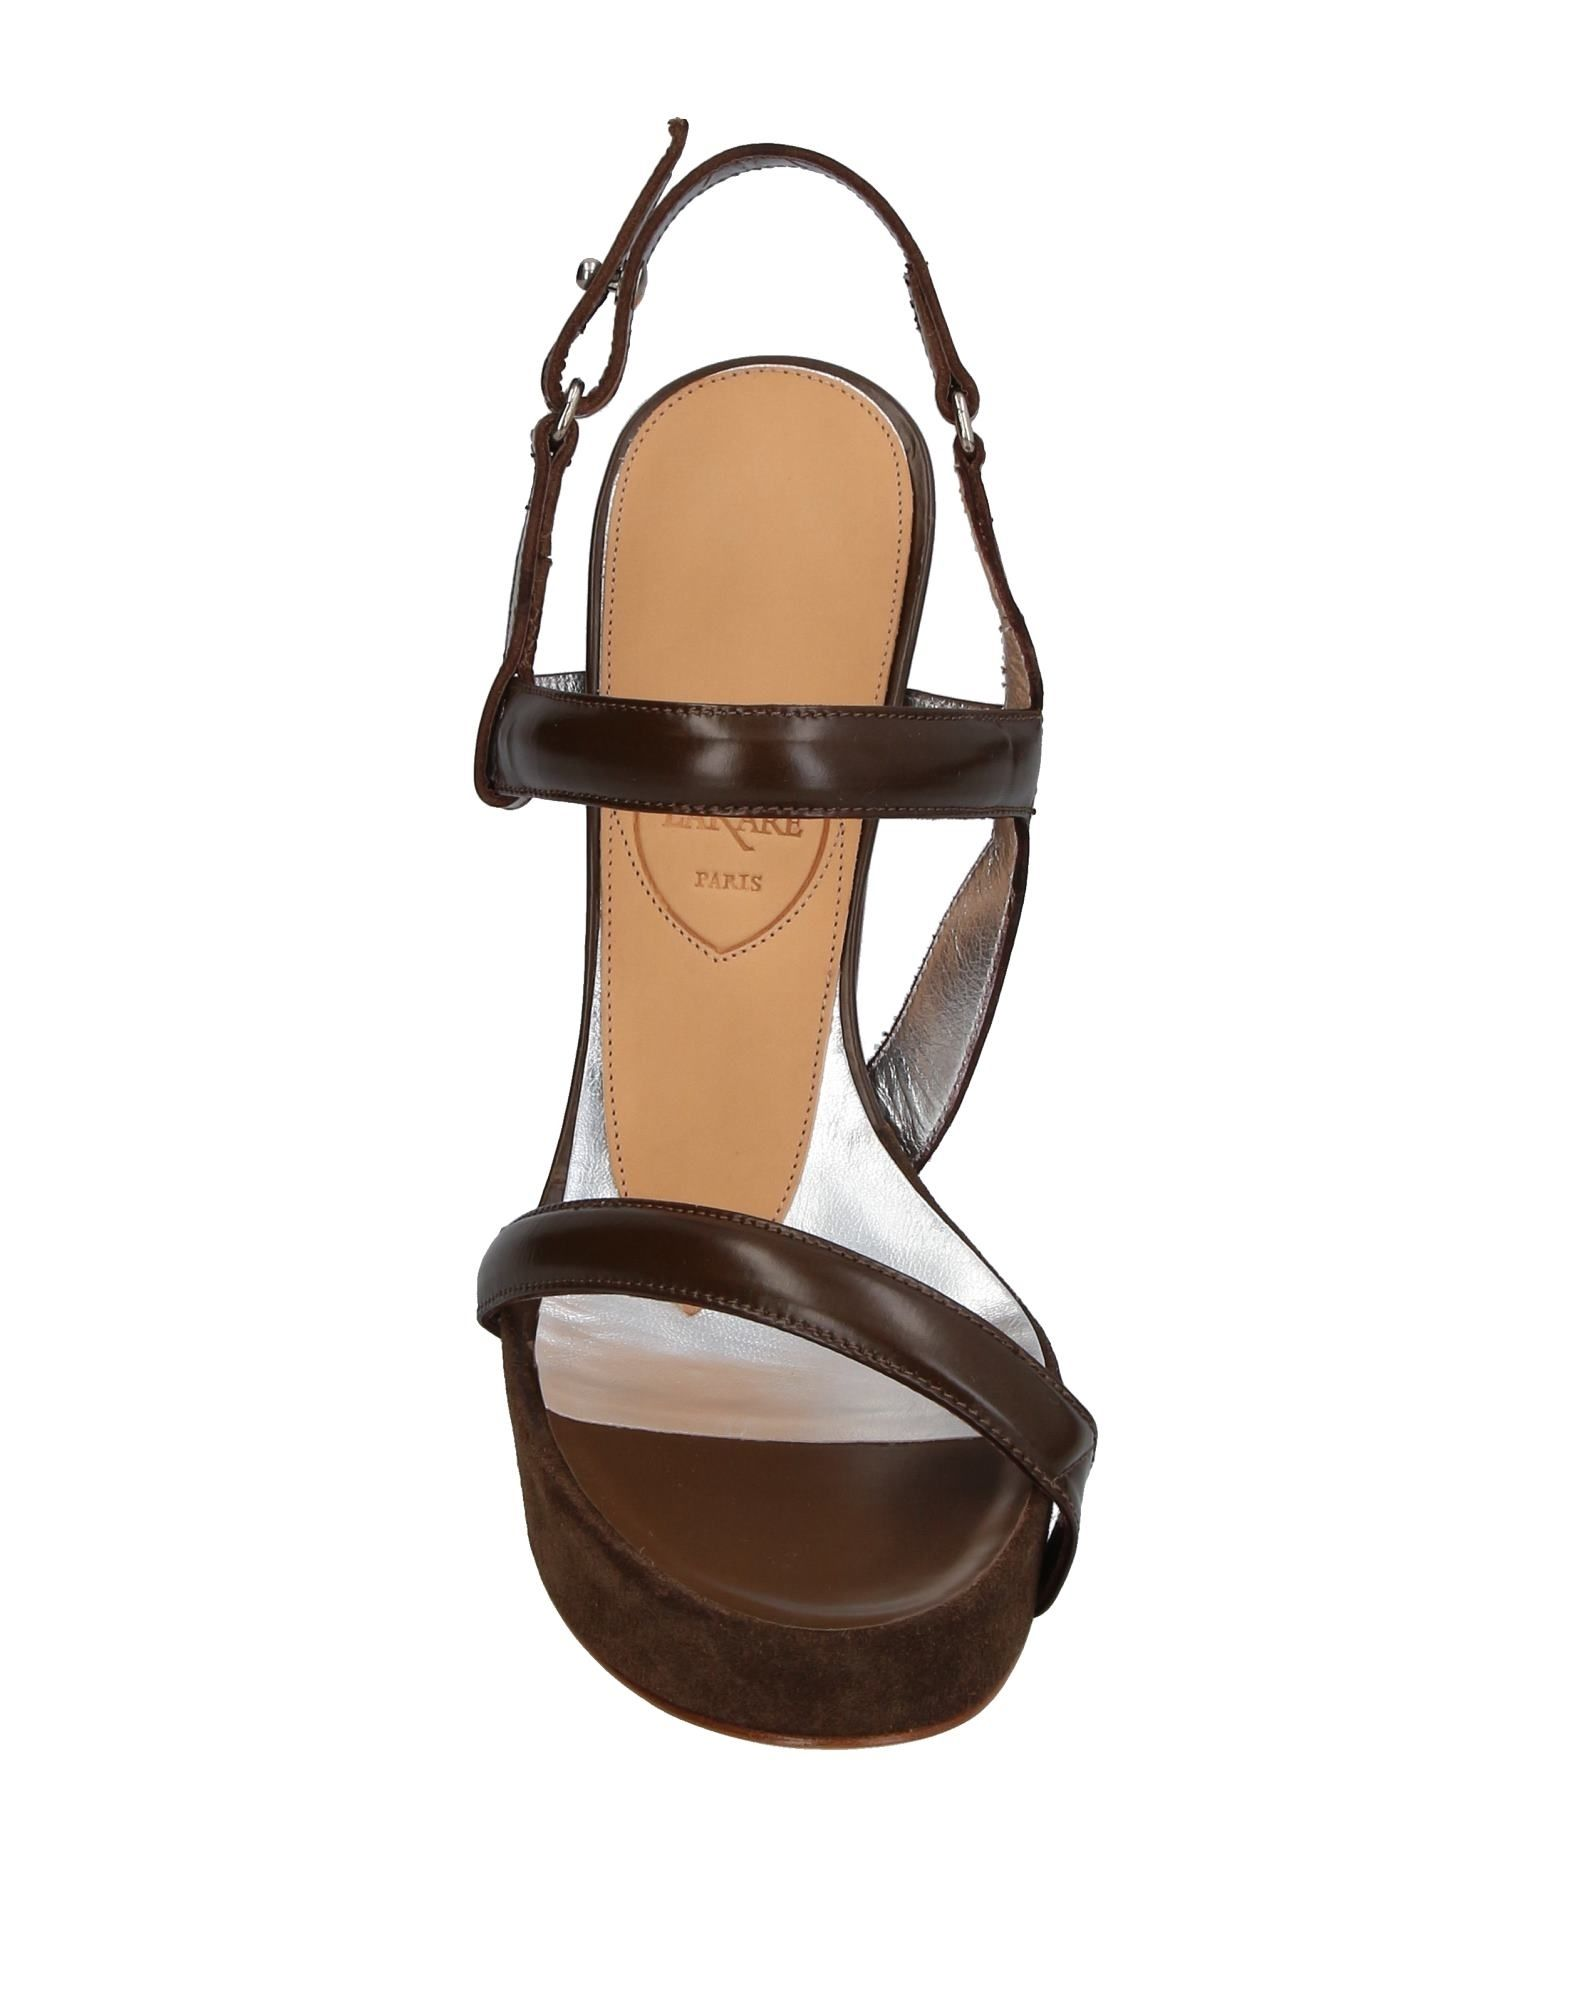 Sandales Larare Femme - Sandales Larare sur